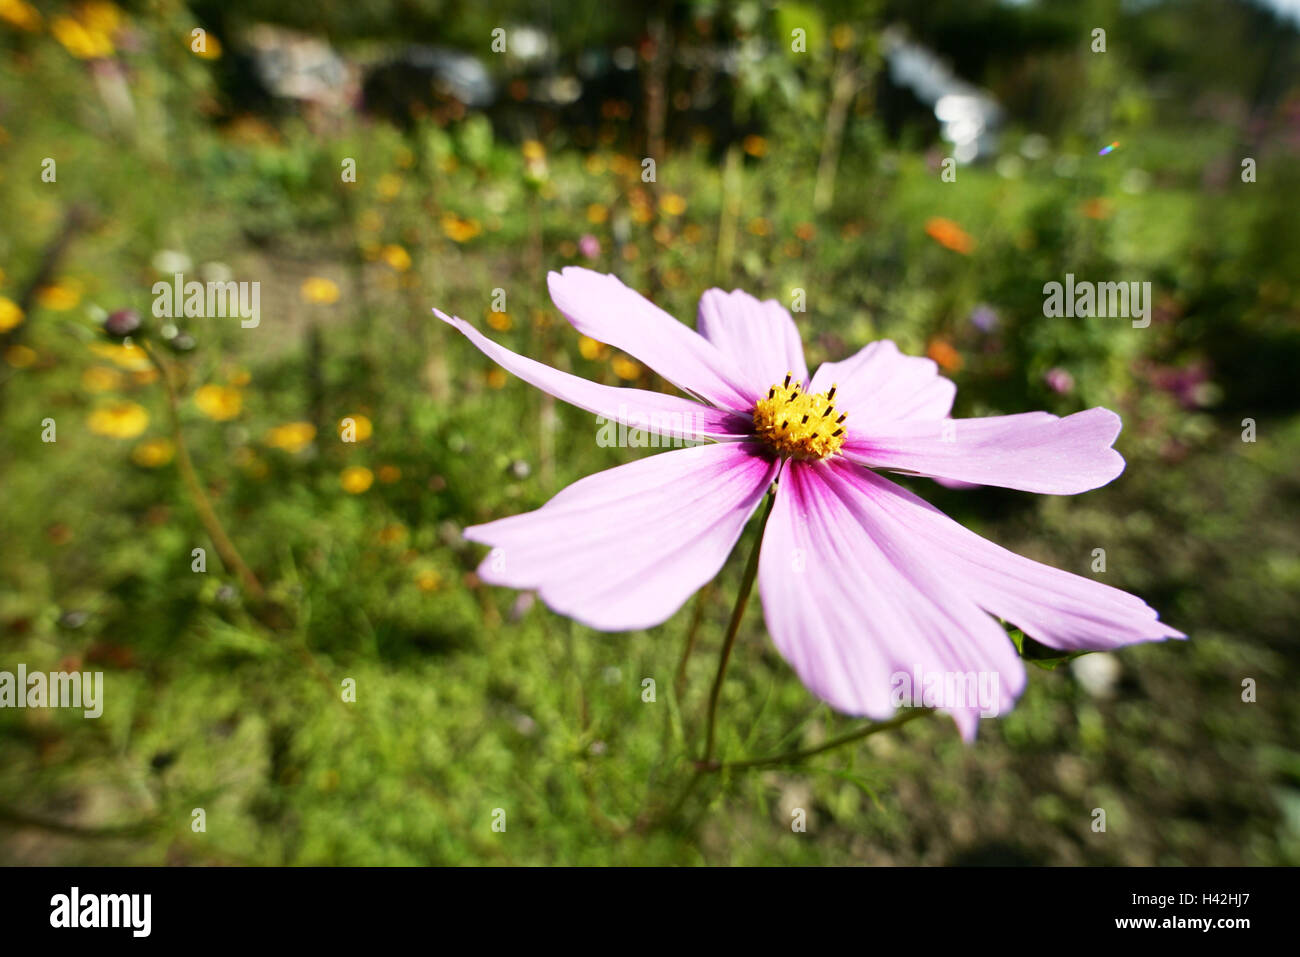 Prato kosmee cosmos bipinnatus dettaglio blossom rosa